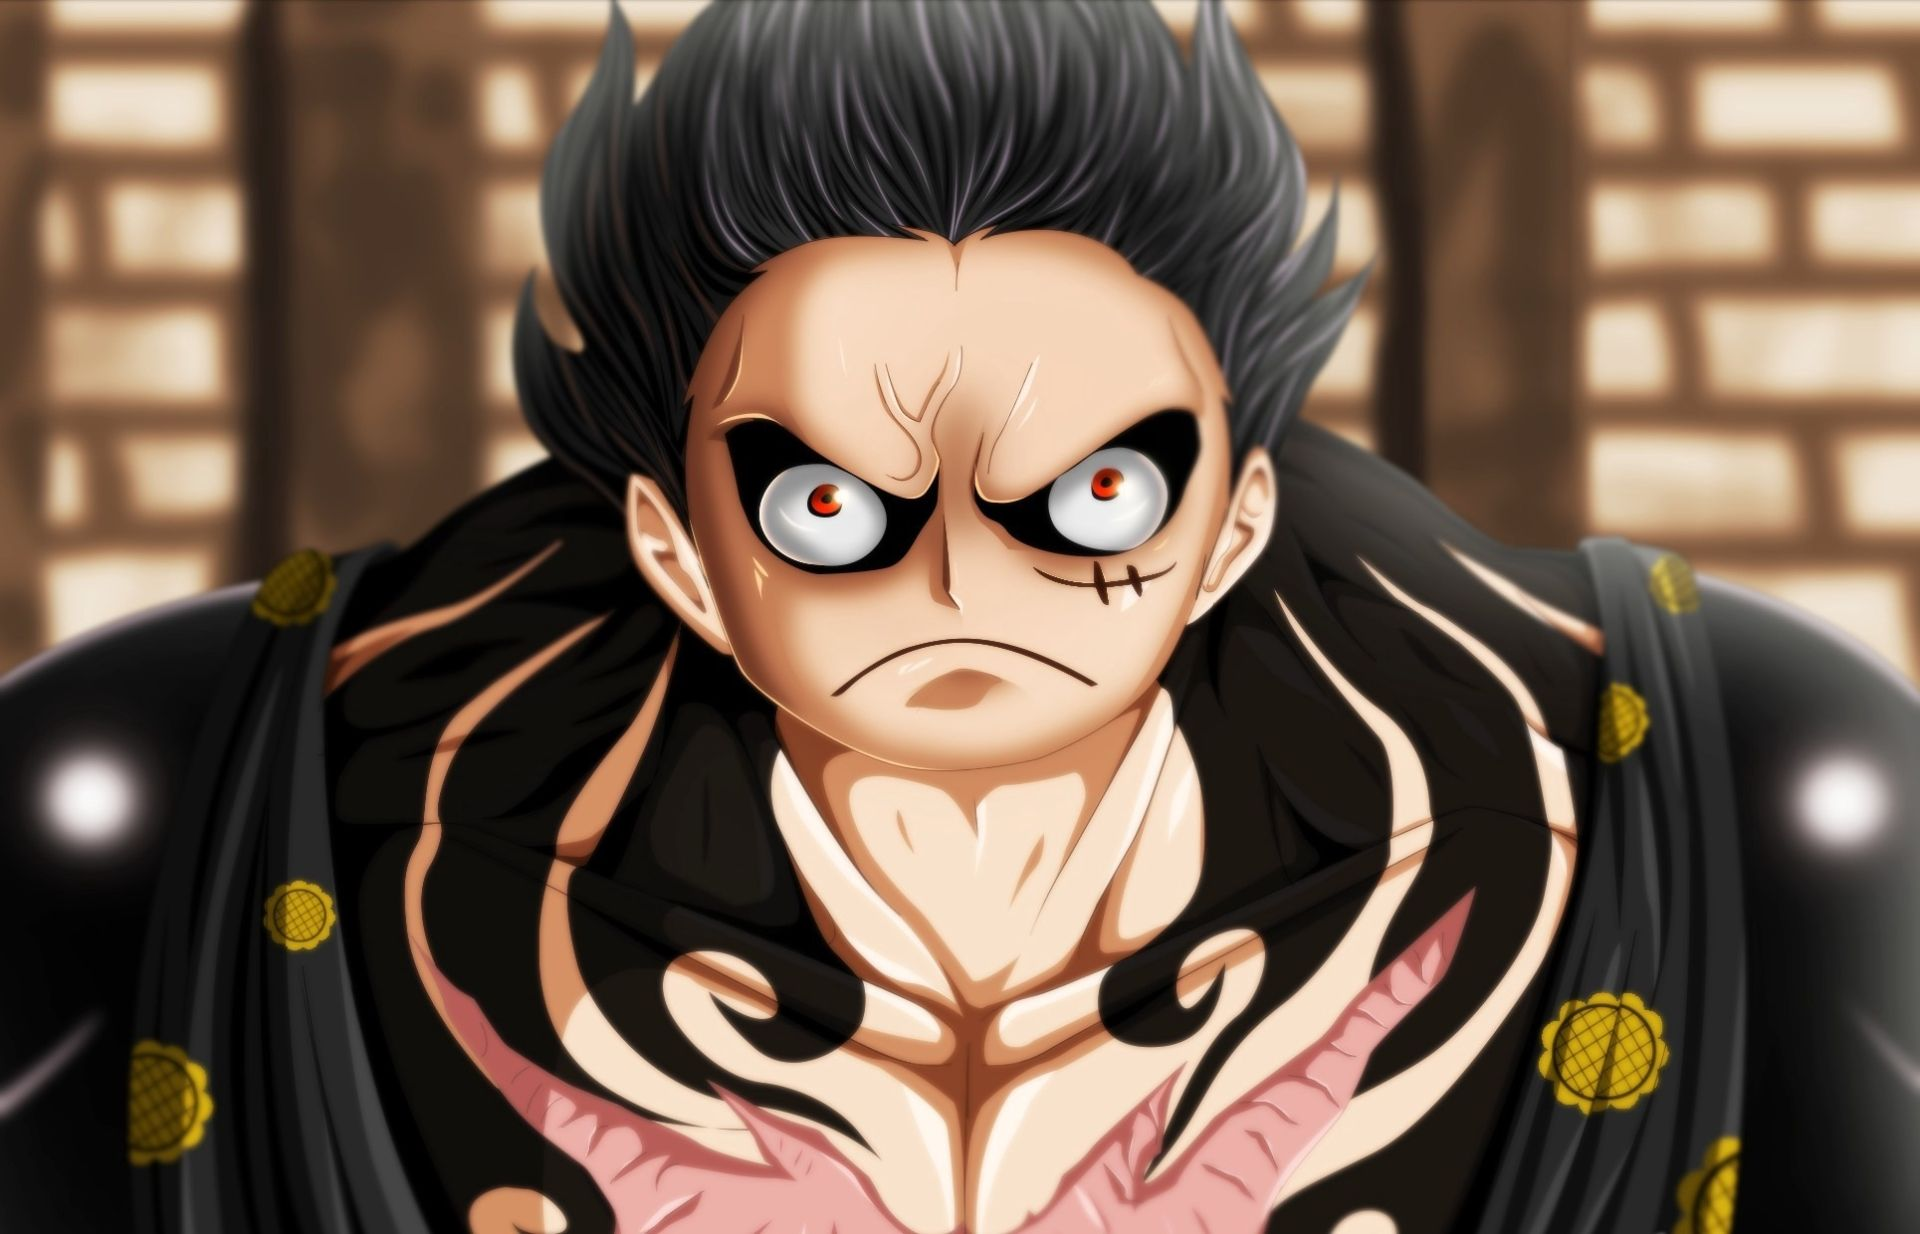 Anime One Piece Monkey D Luffy Gear Fourth Wallpaper